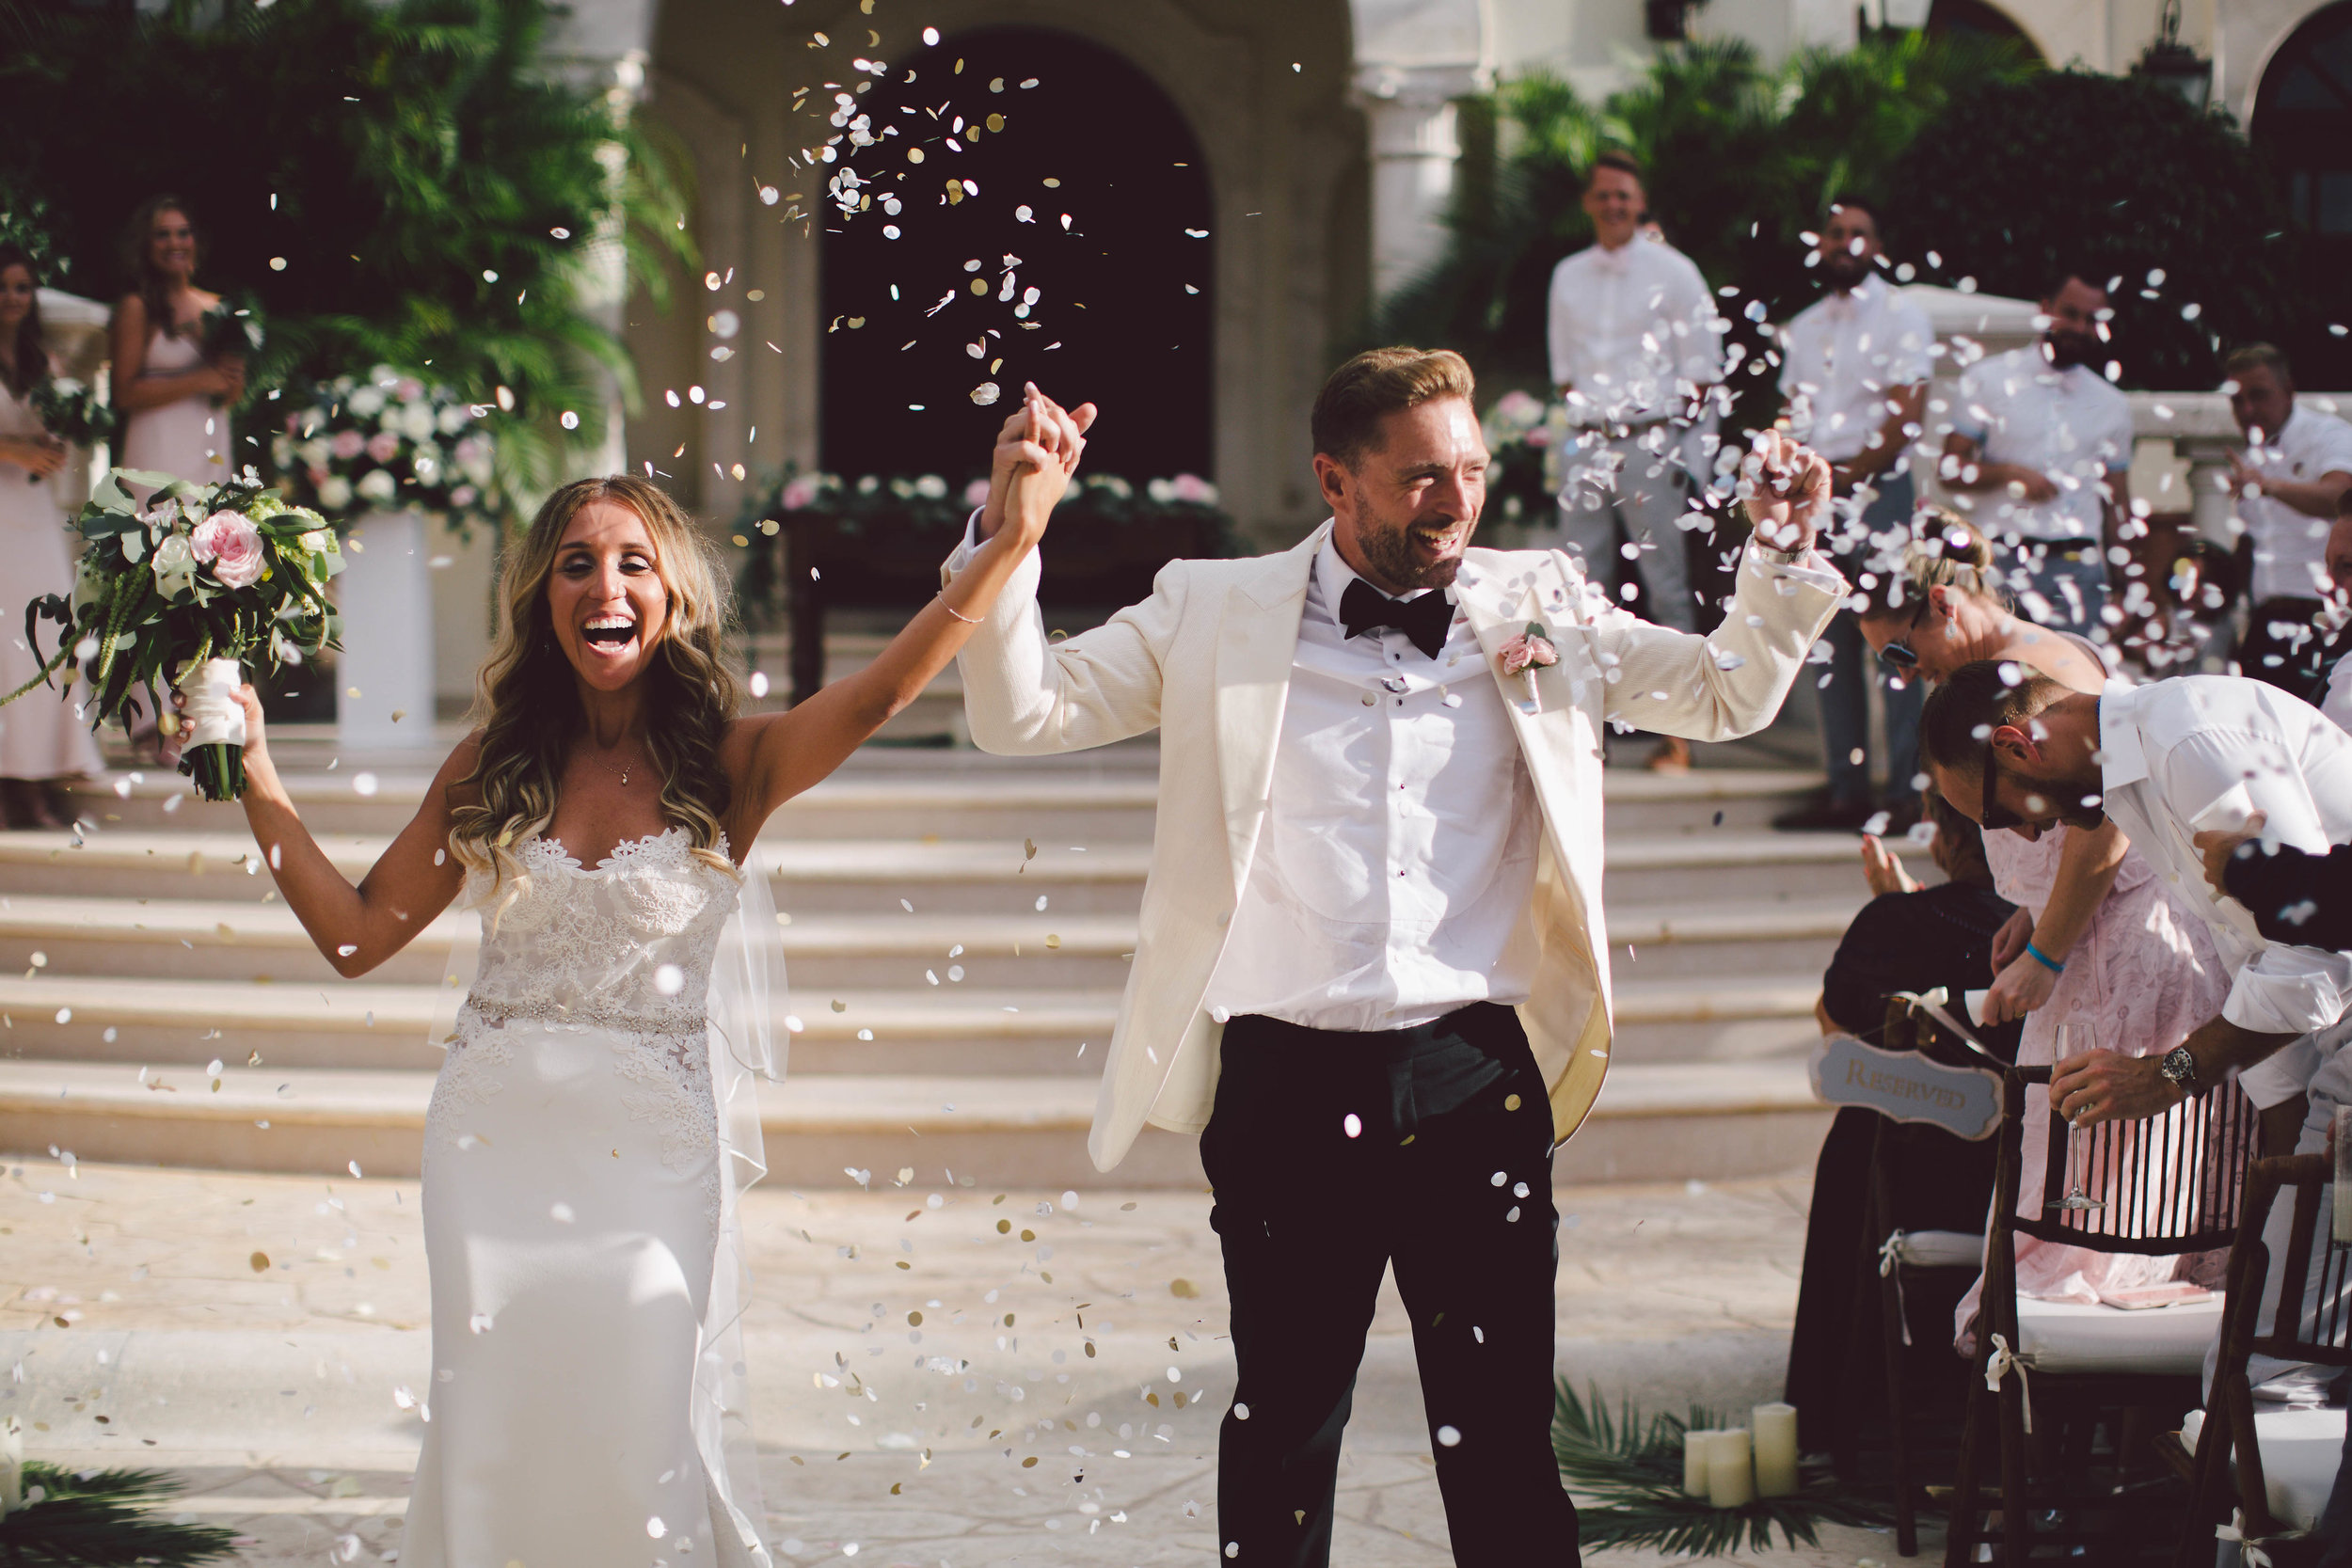 mexico_wedding_cancun_villa_la_joya_evangeline_lane_069.jpg